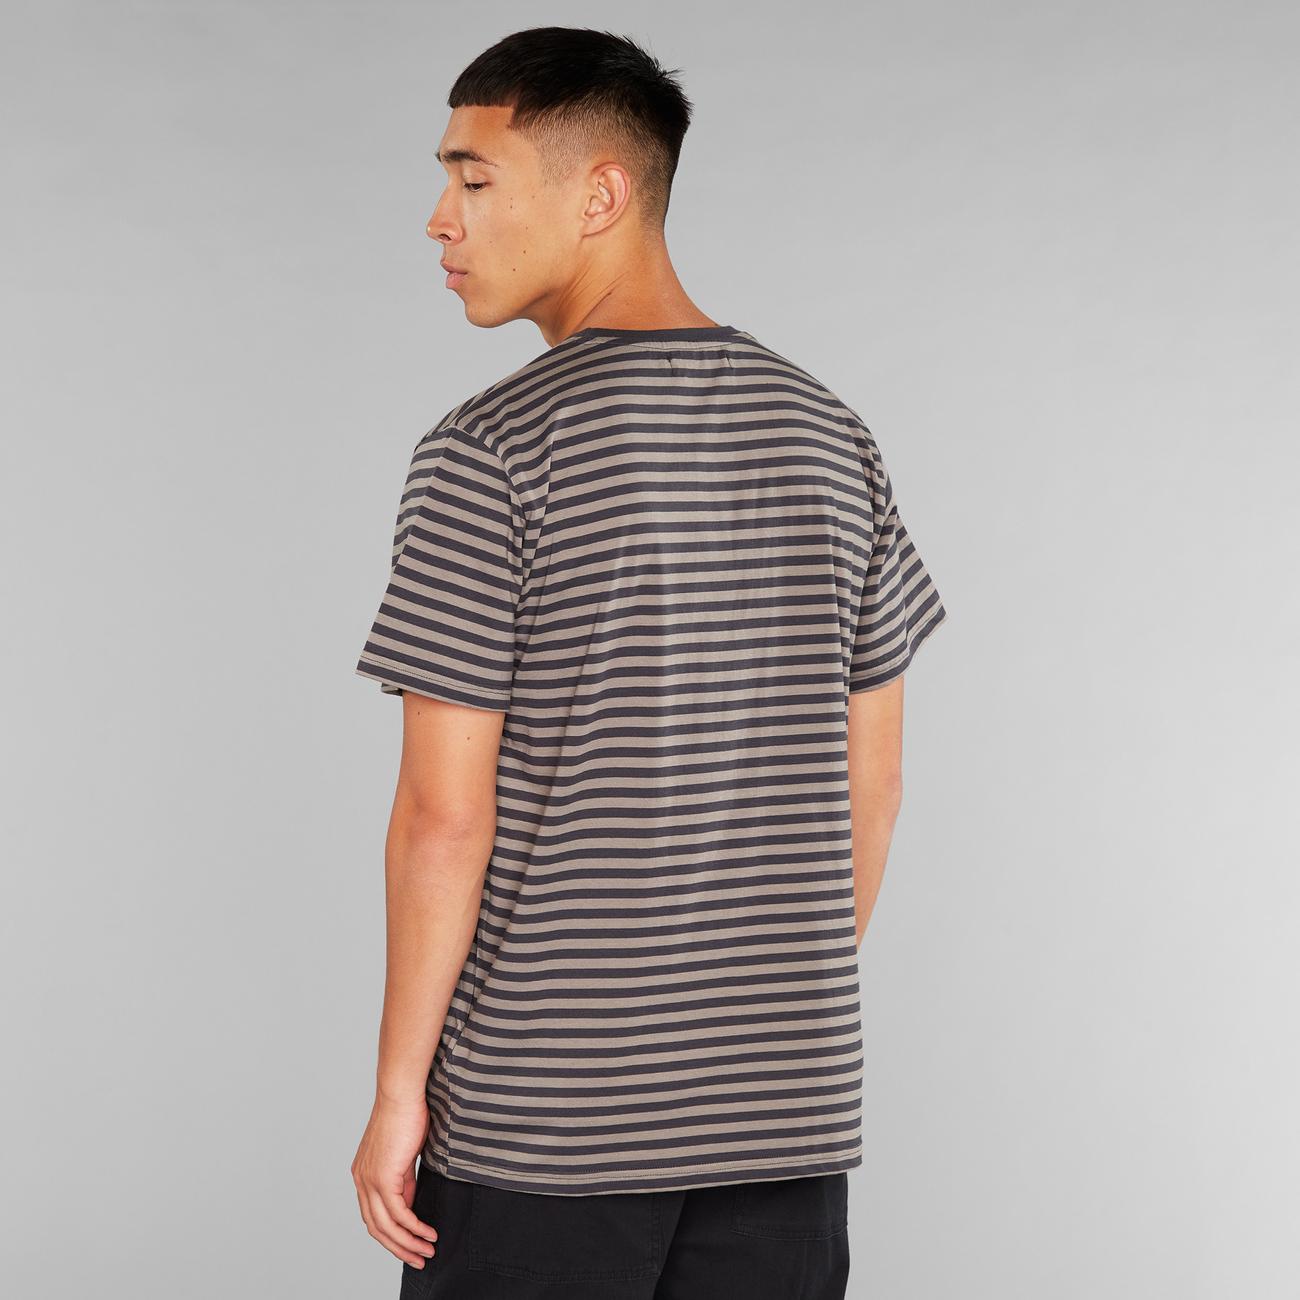 T-shirt Stockholm Stripes Charcoal